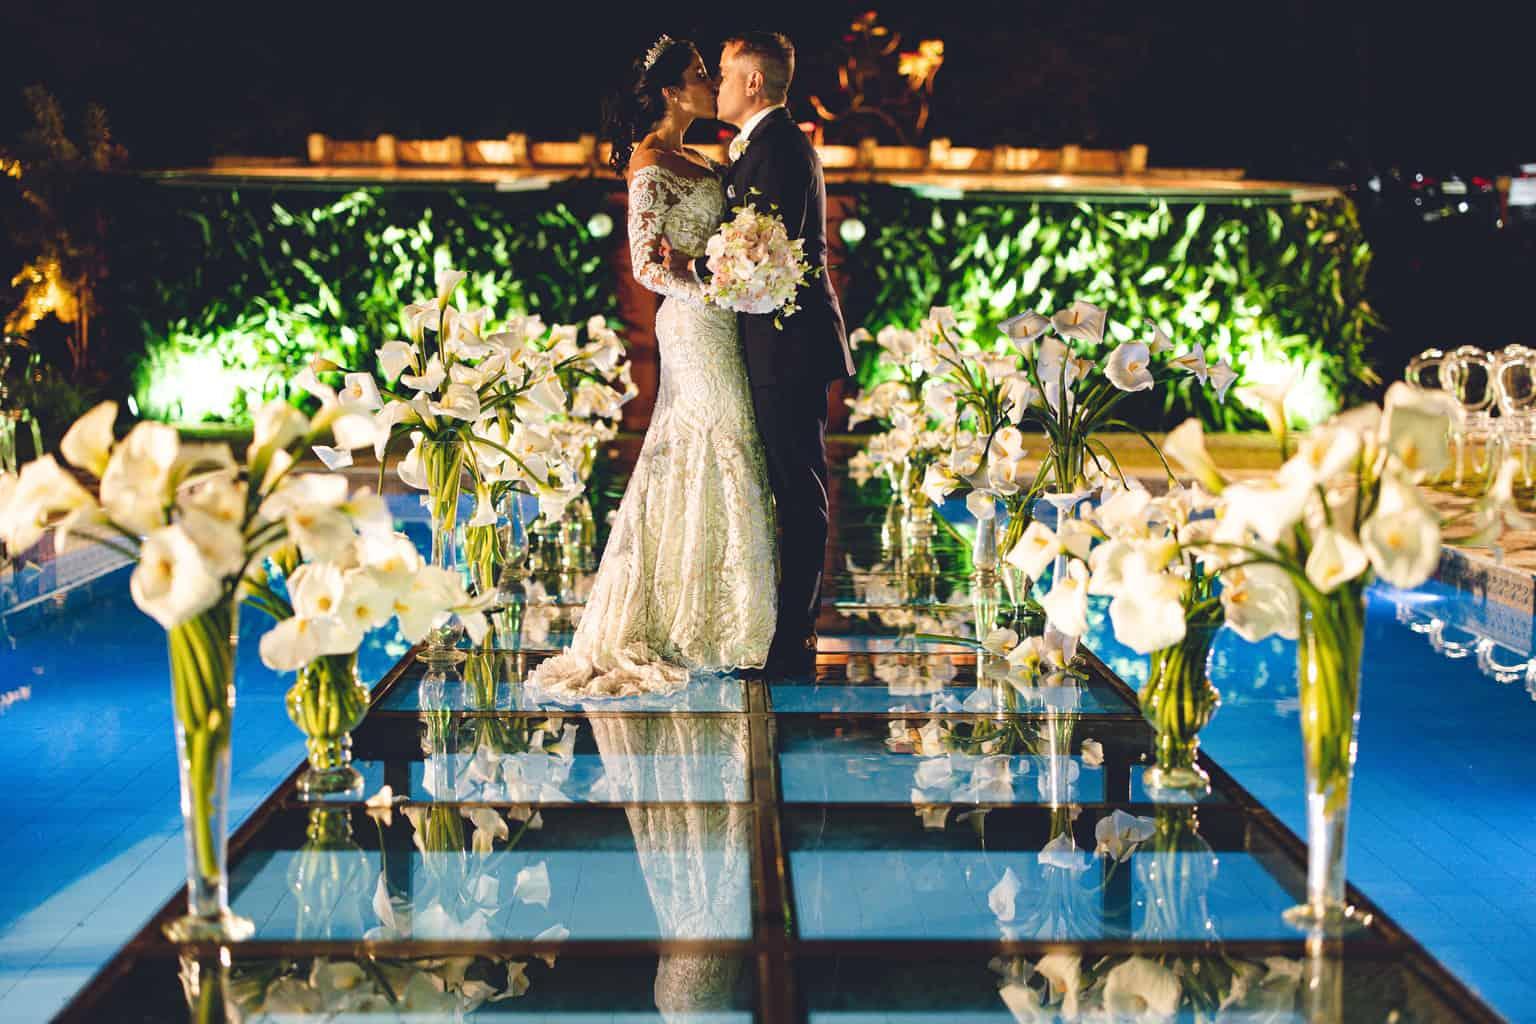 Casamento-de-Bianka-e-Nilo-Fotografia-Marcelo-Schmoeller-SC-Alameda-Casa-Rosa-03082019_bianka-e-nilo_2193